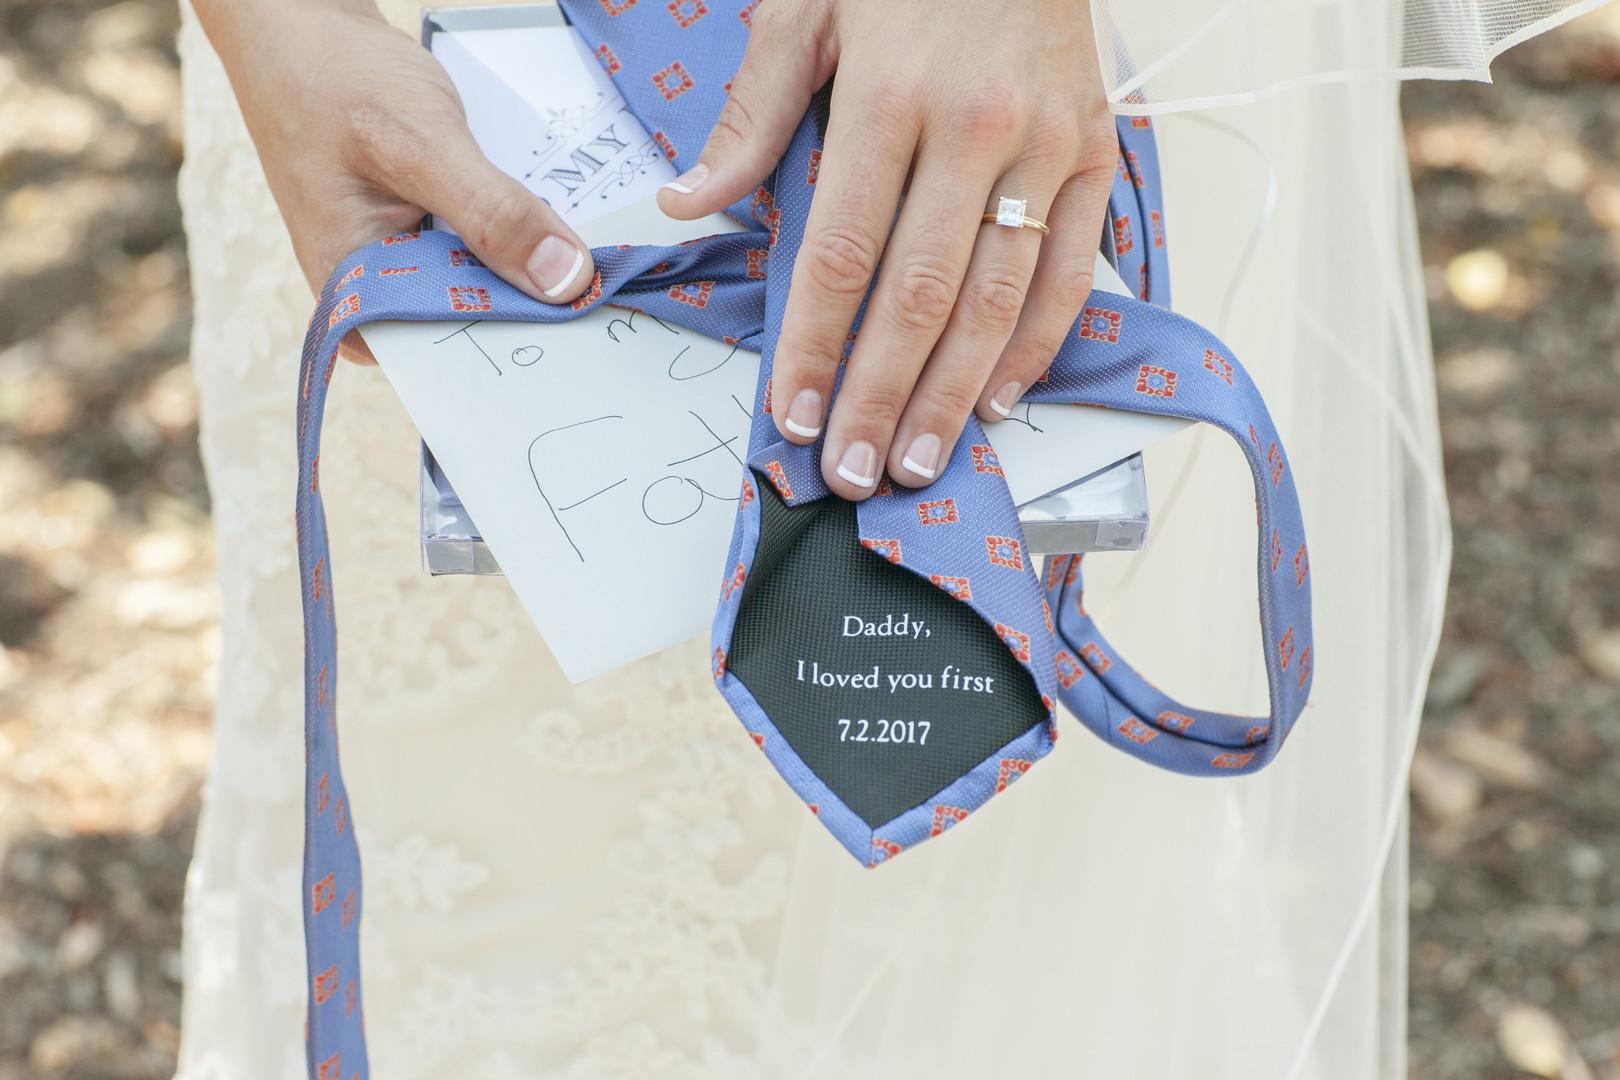 www.santabarbarawedding.com | Venue: Dos Pueblos Ranch | Photographer: ByCherry Photography | Event Designer: Elan Event Rentals |  Father of the Bride's Tie